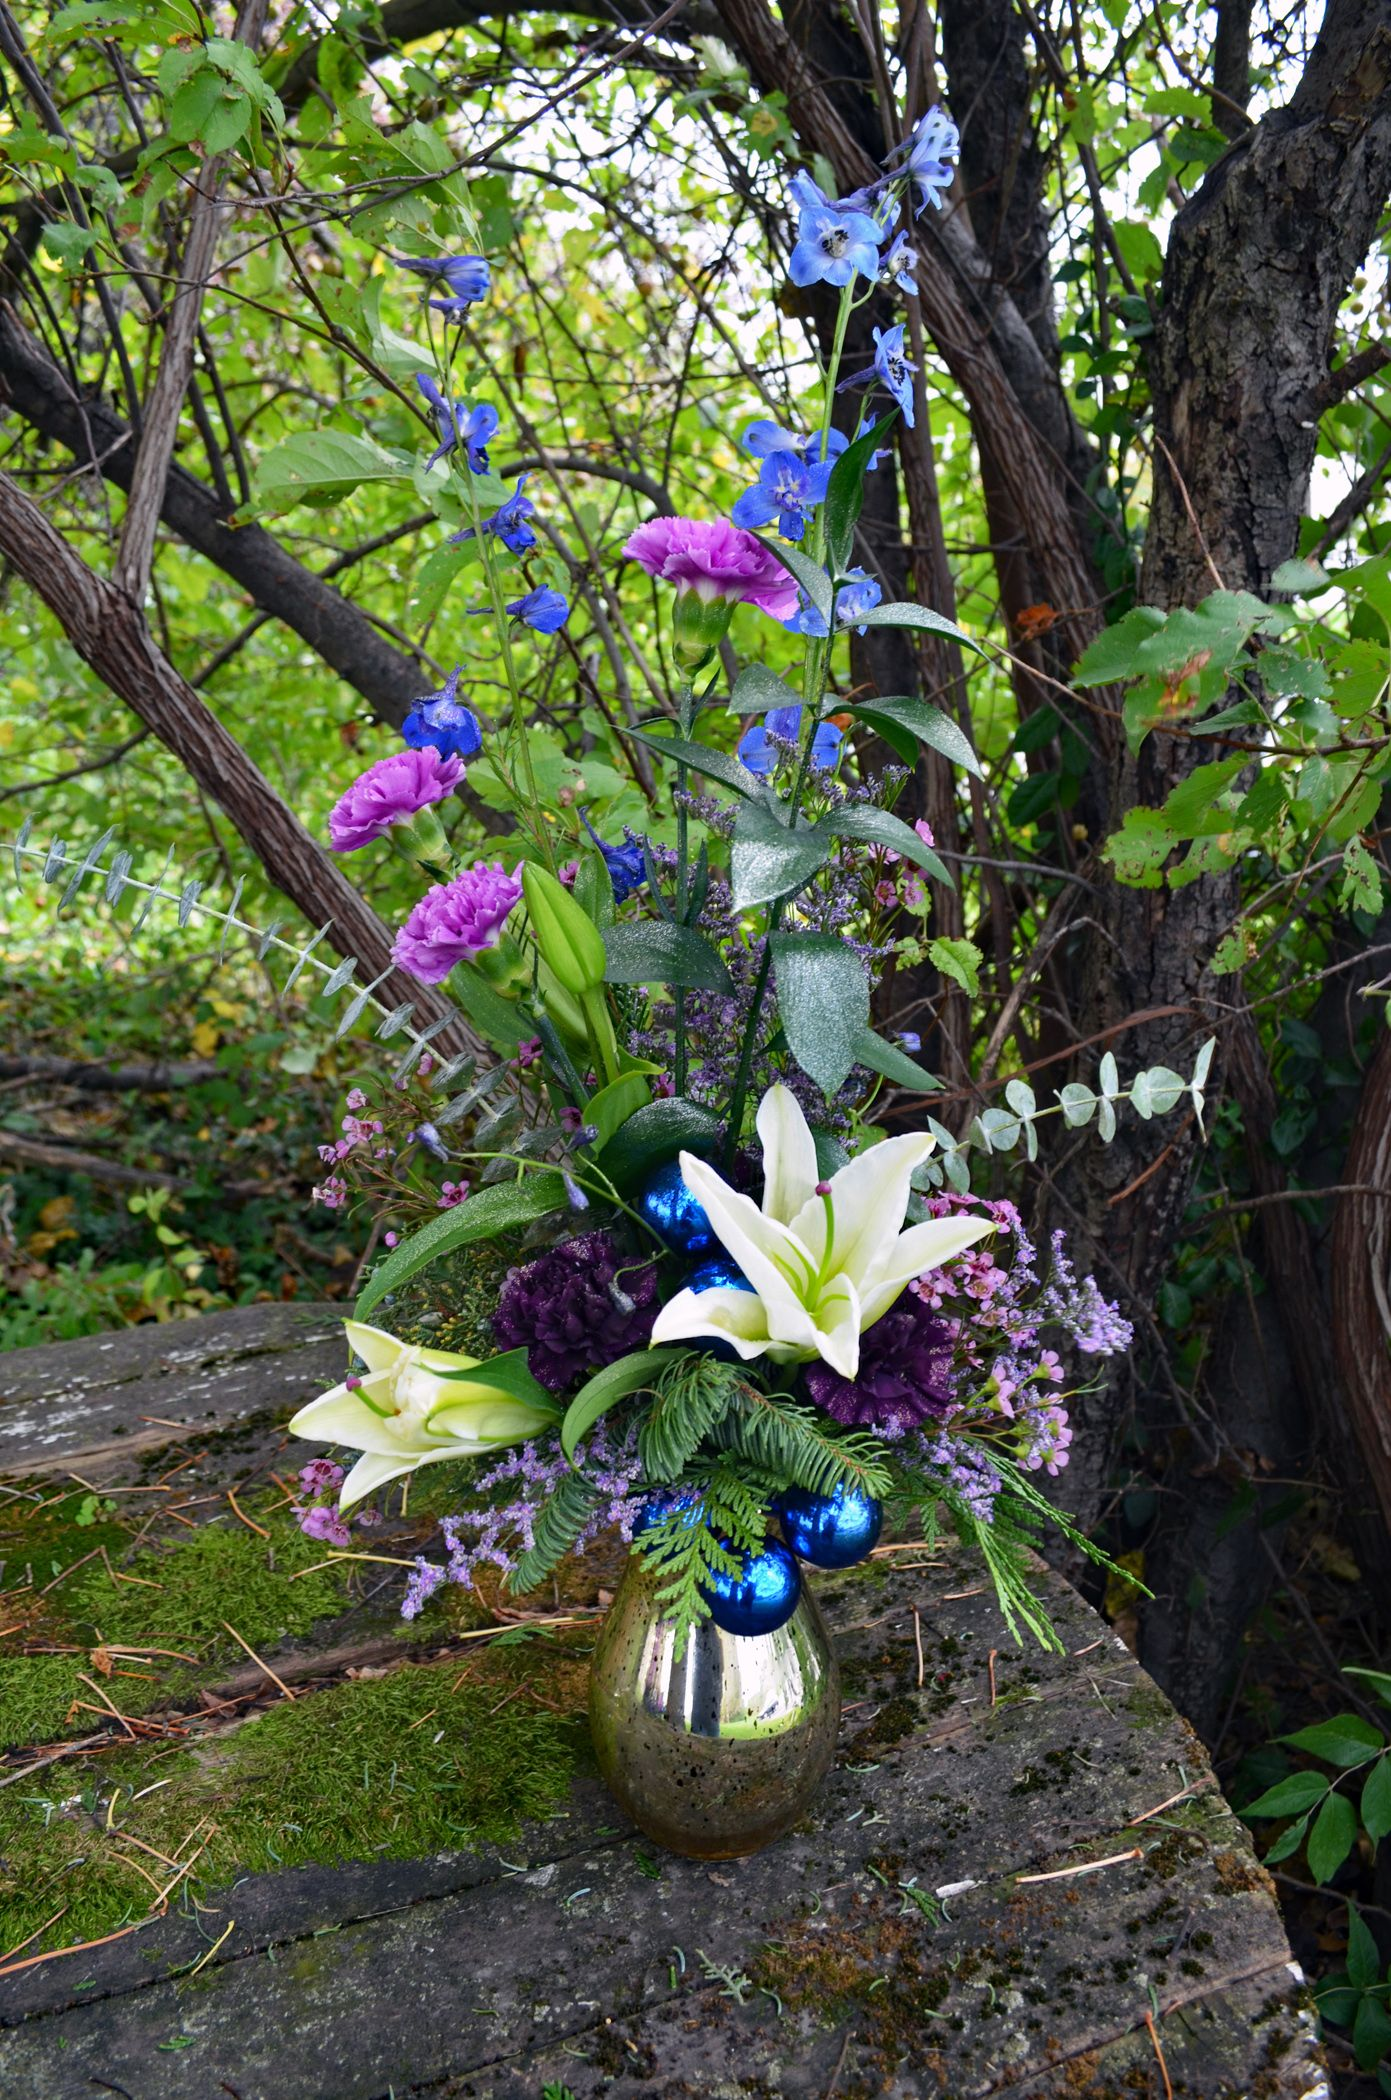 Frolic gillespie florists indianapolis in mercury glass vase is frolic gillespie florists indianapolis in mercury glass vase is filled with blue delphinium izmirmasajfo